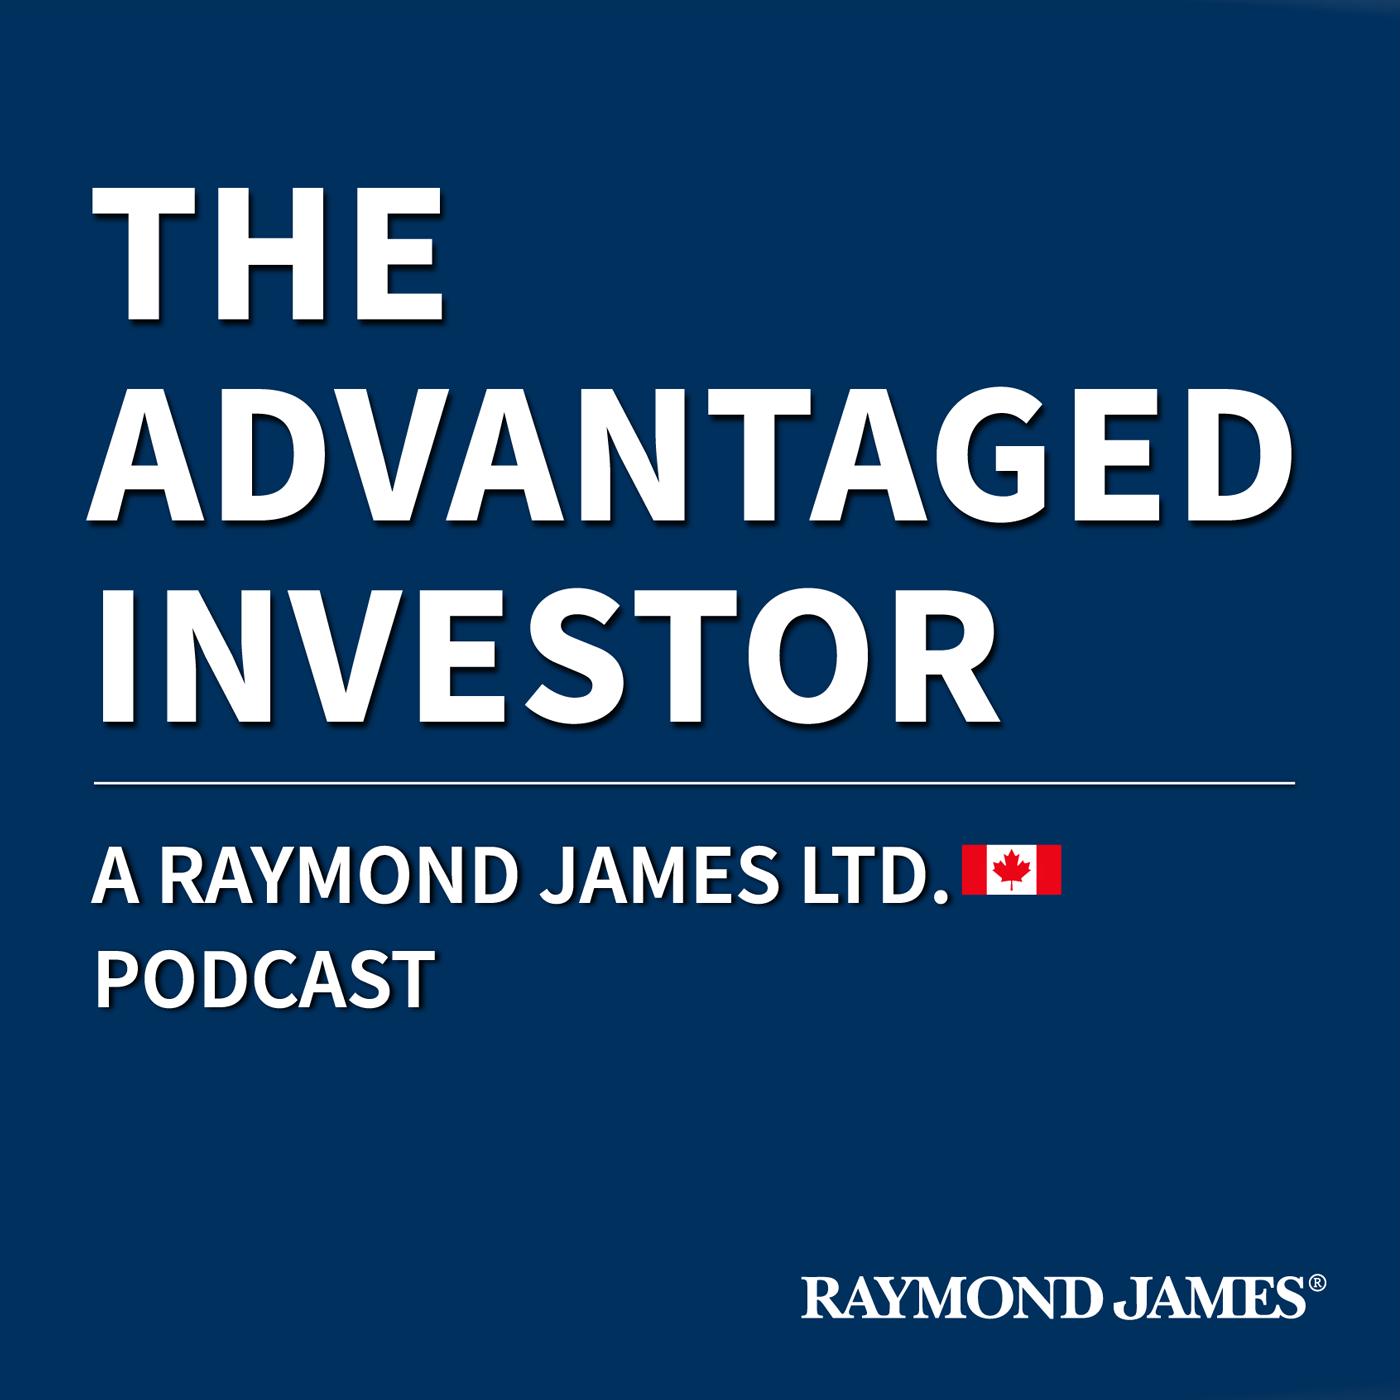 The Advantaged Investor from Raymond James Canada